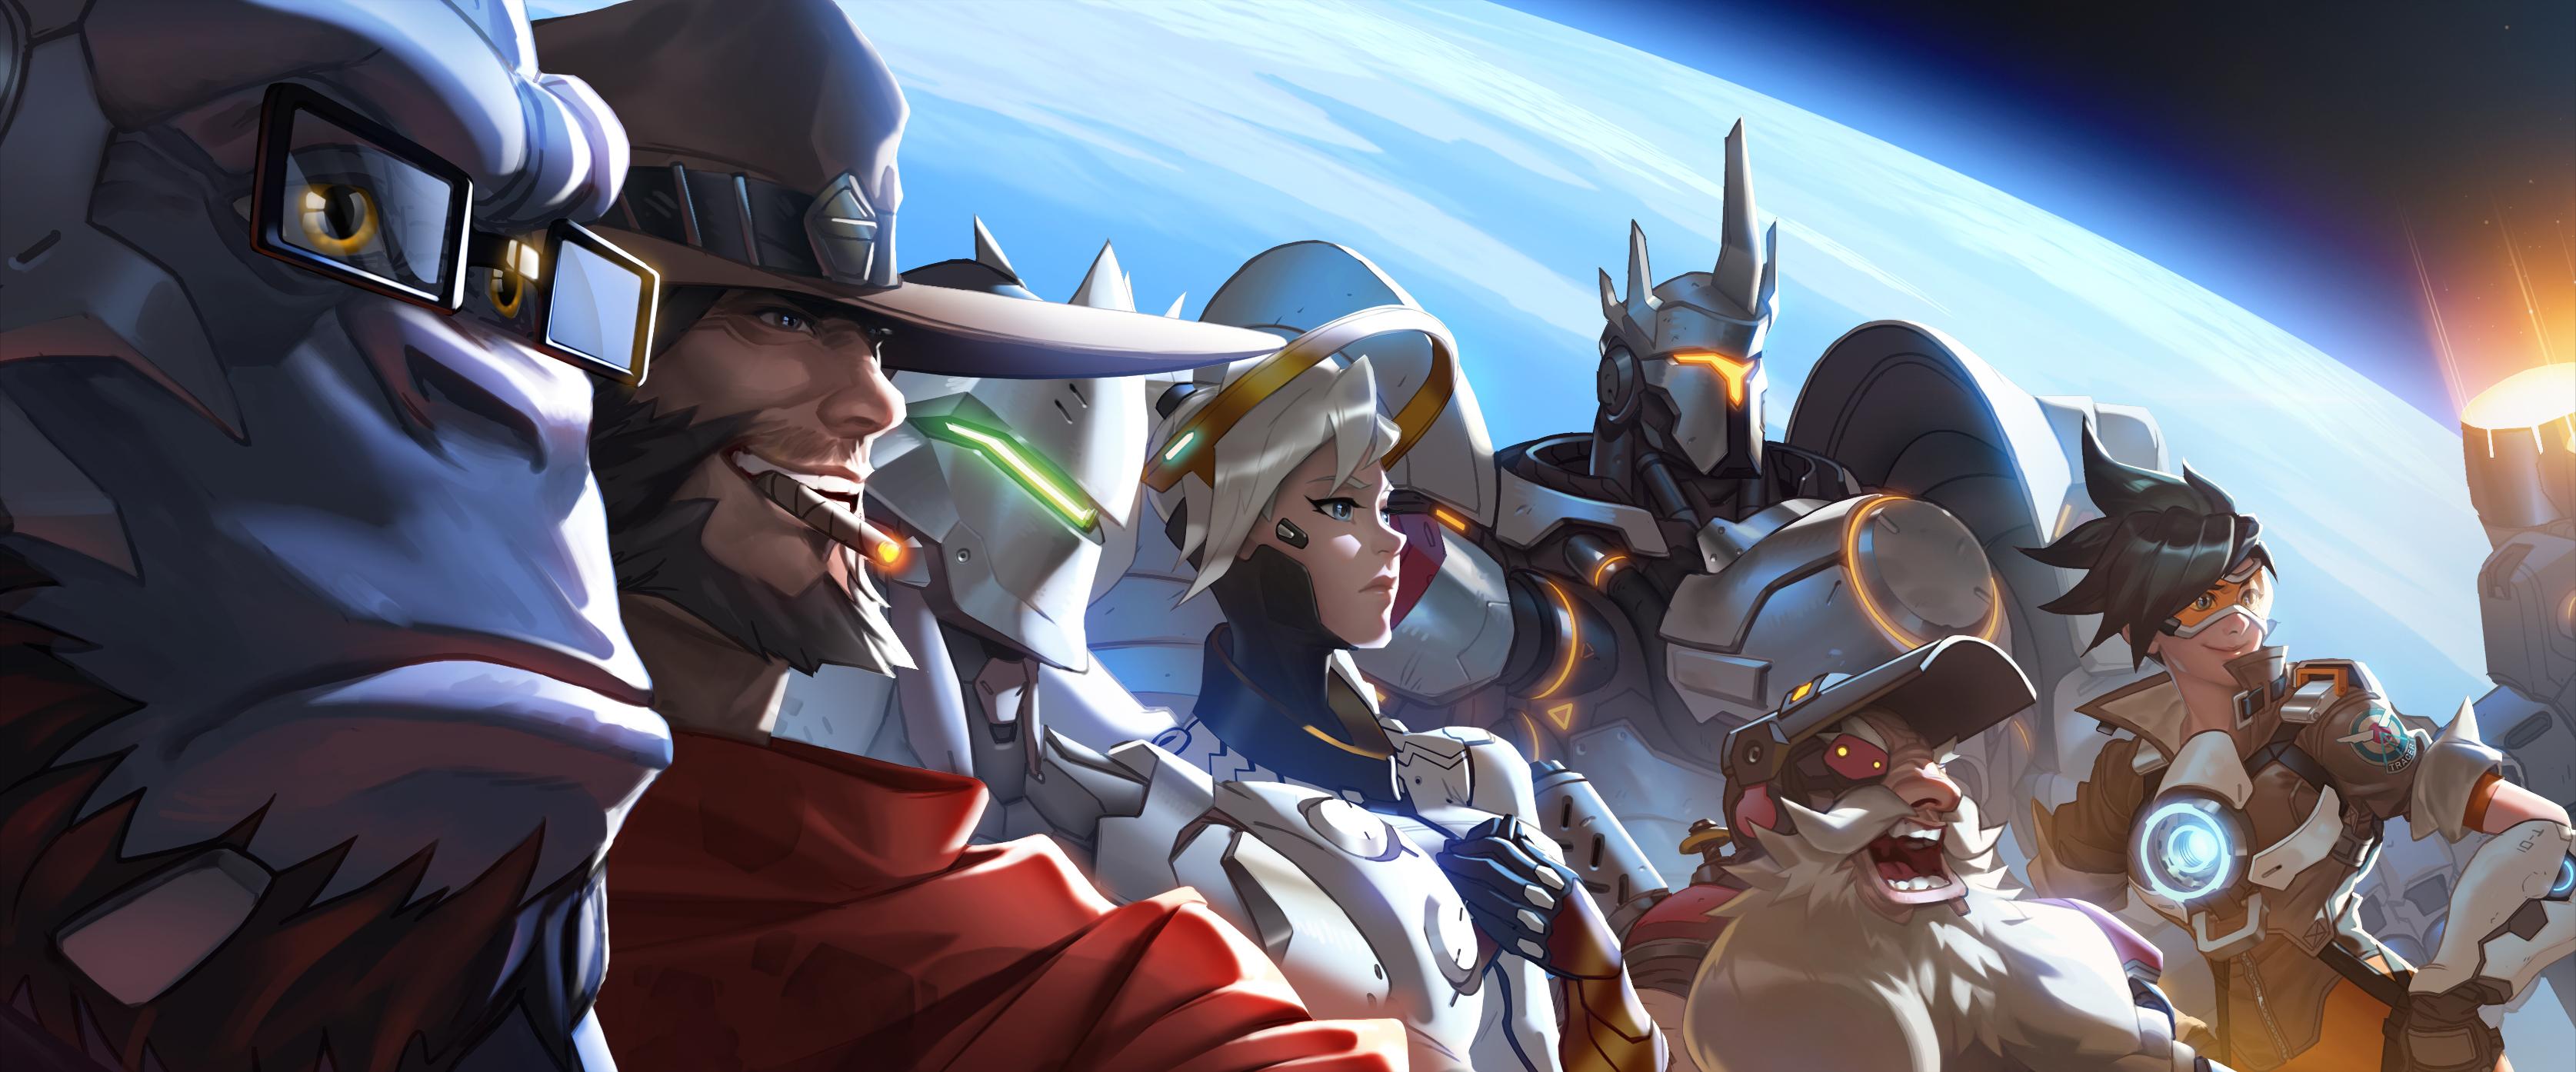 lorekeeper-overwatch-01